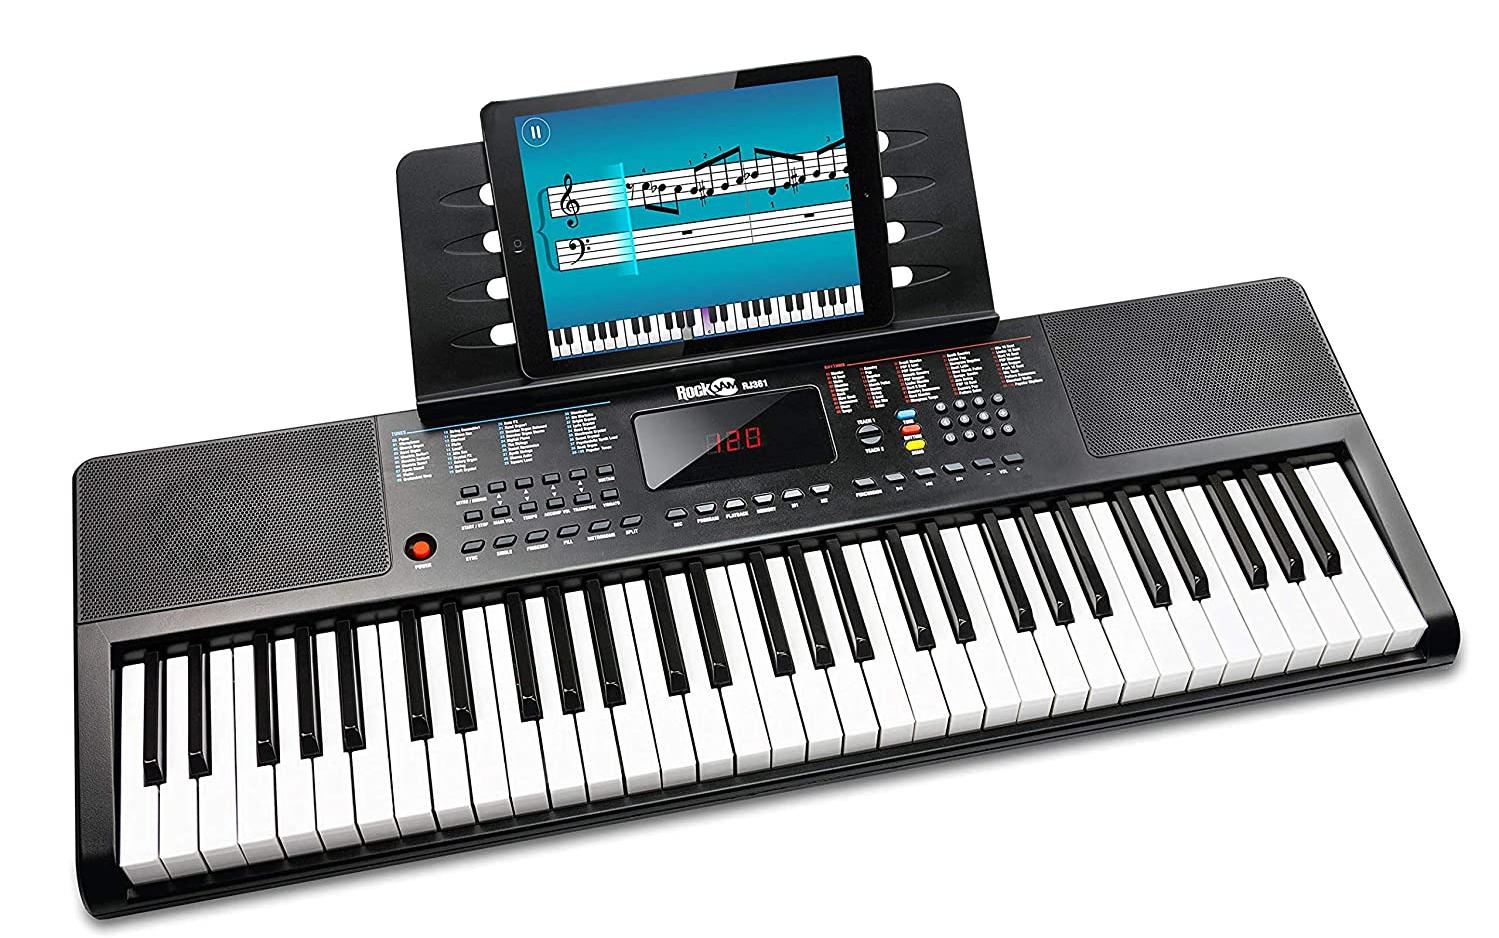 RockJam Electric Keyboard